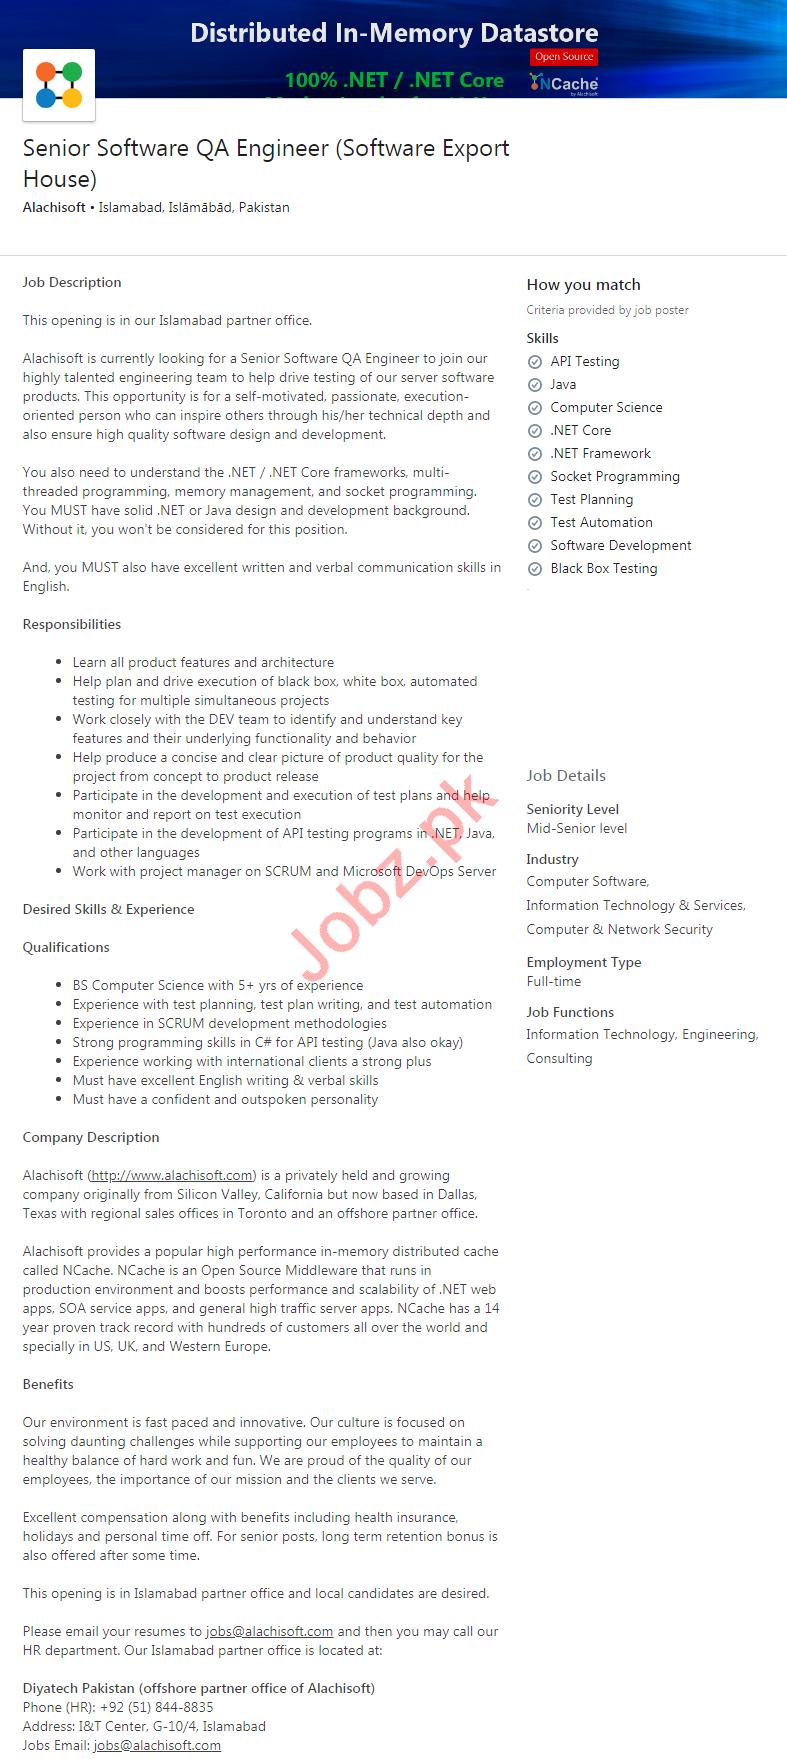 Alachisoft Islamabad Jobs 2020 Senior Software QA Engineer